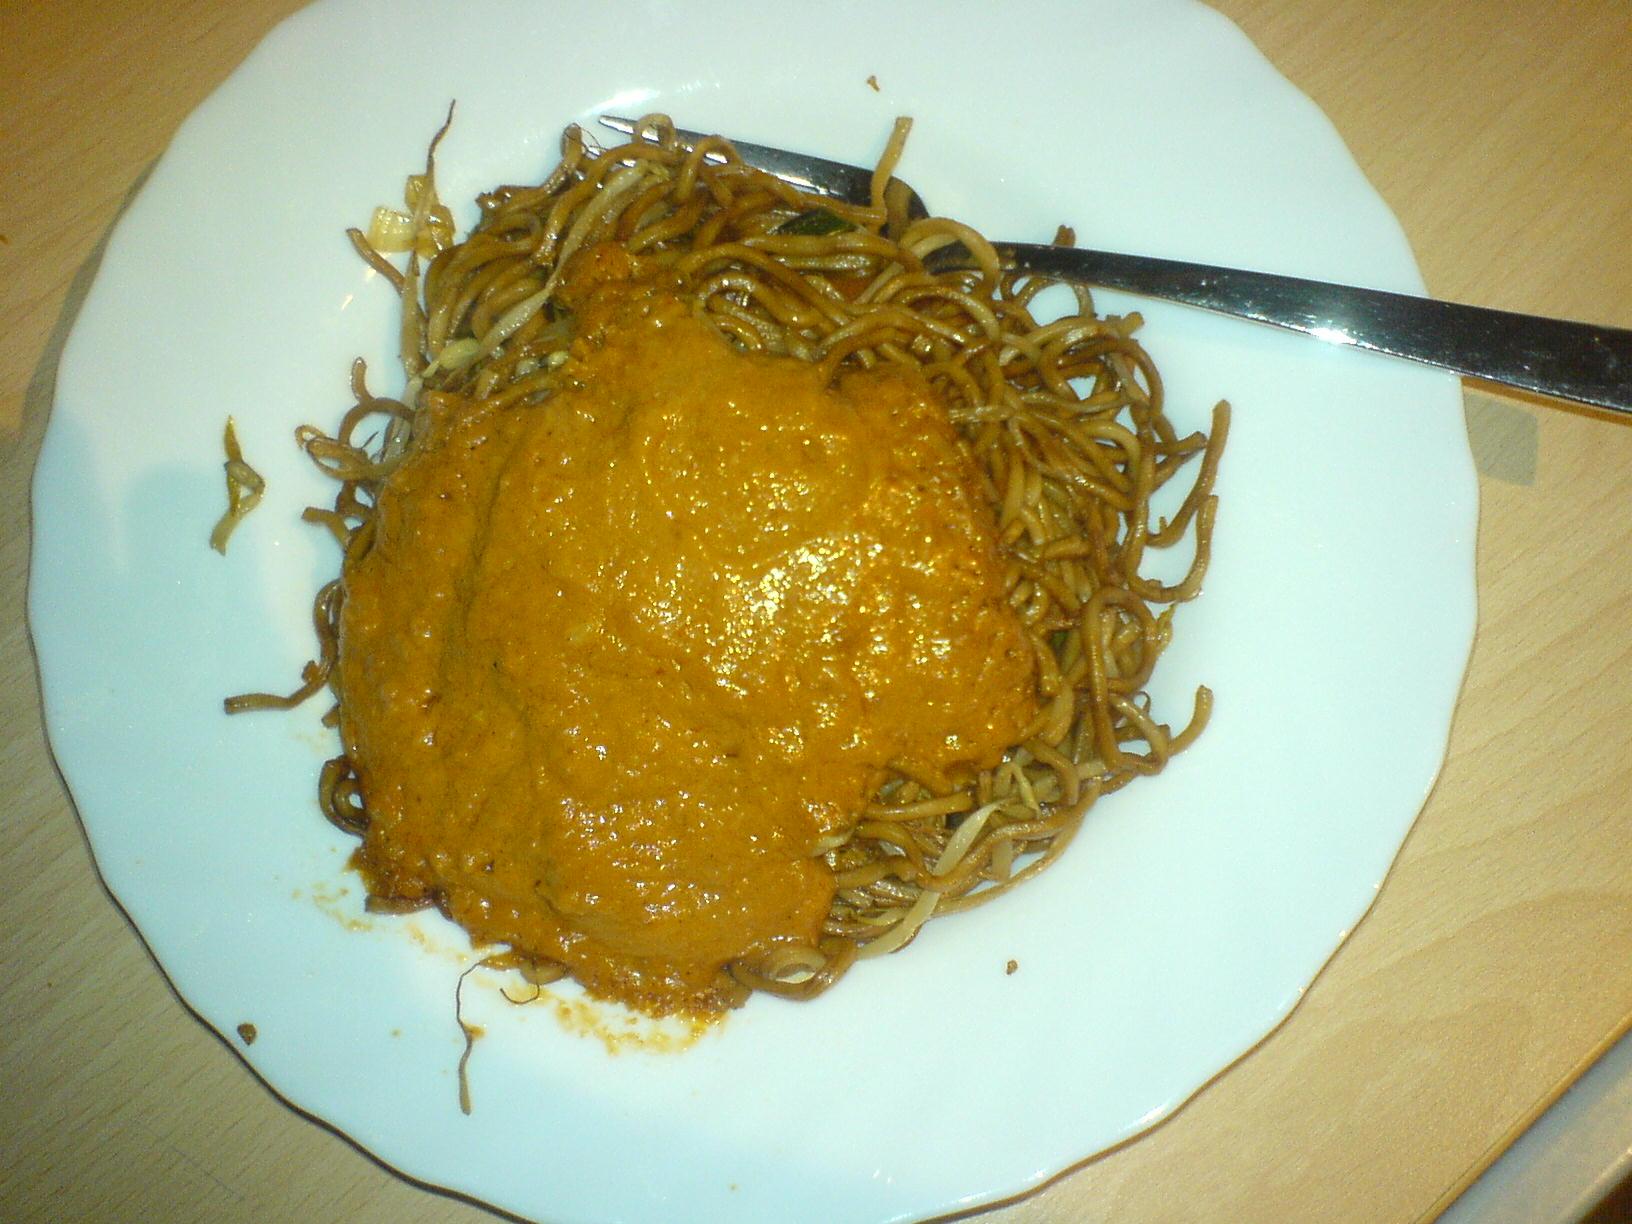 https://foodloader.net/Holz_2008-02-25_Asianudeln_in_Satesauce.jpg